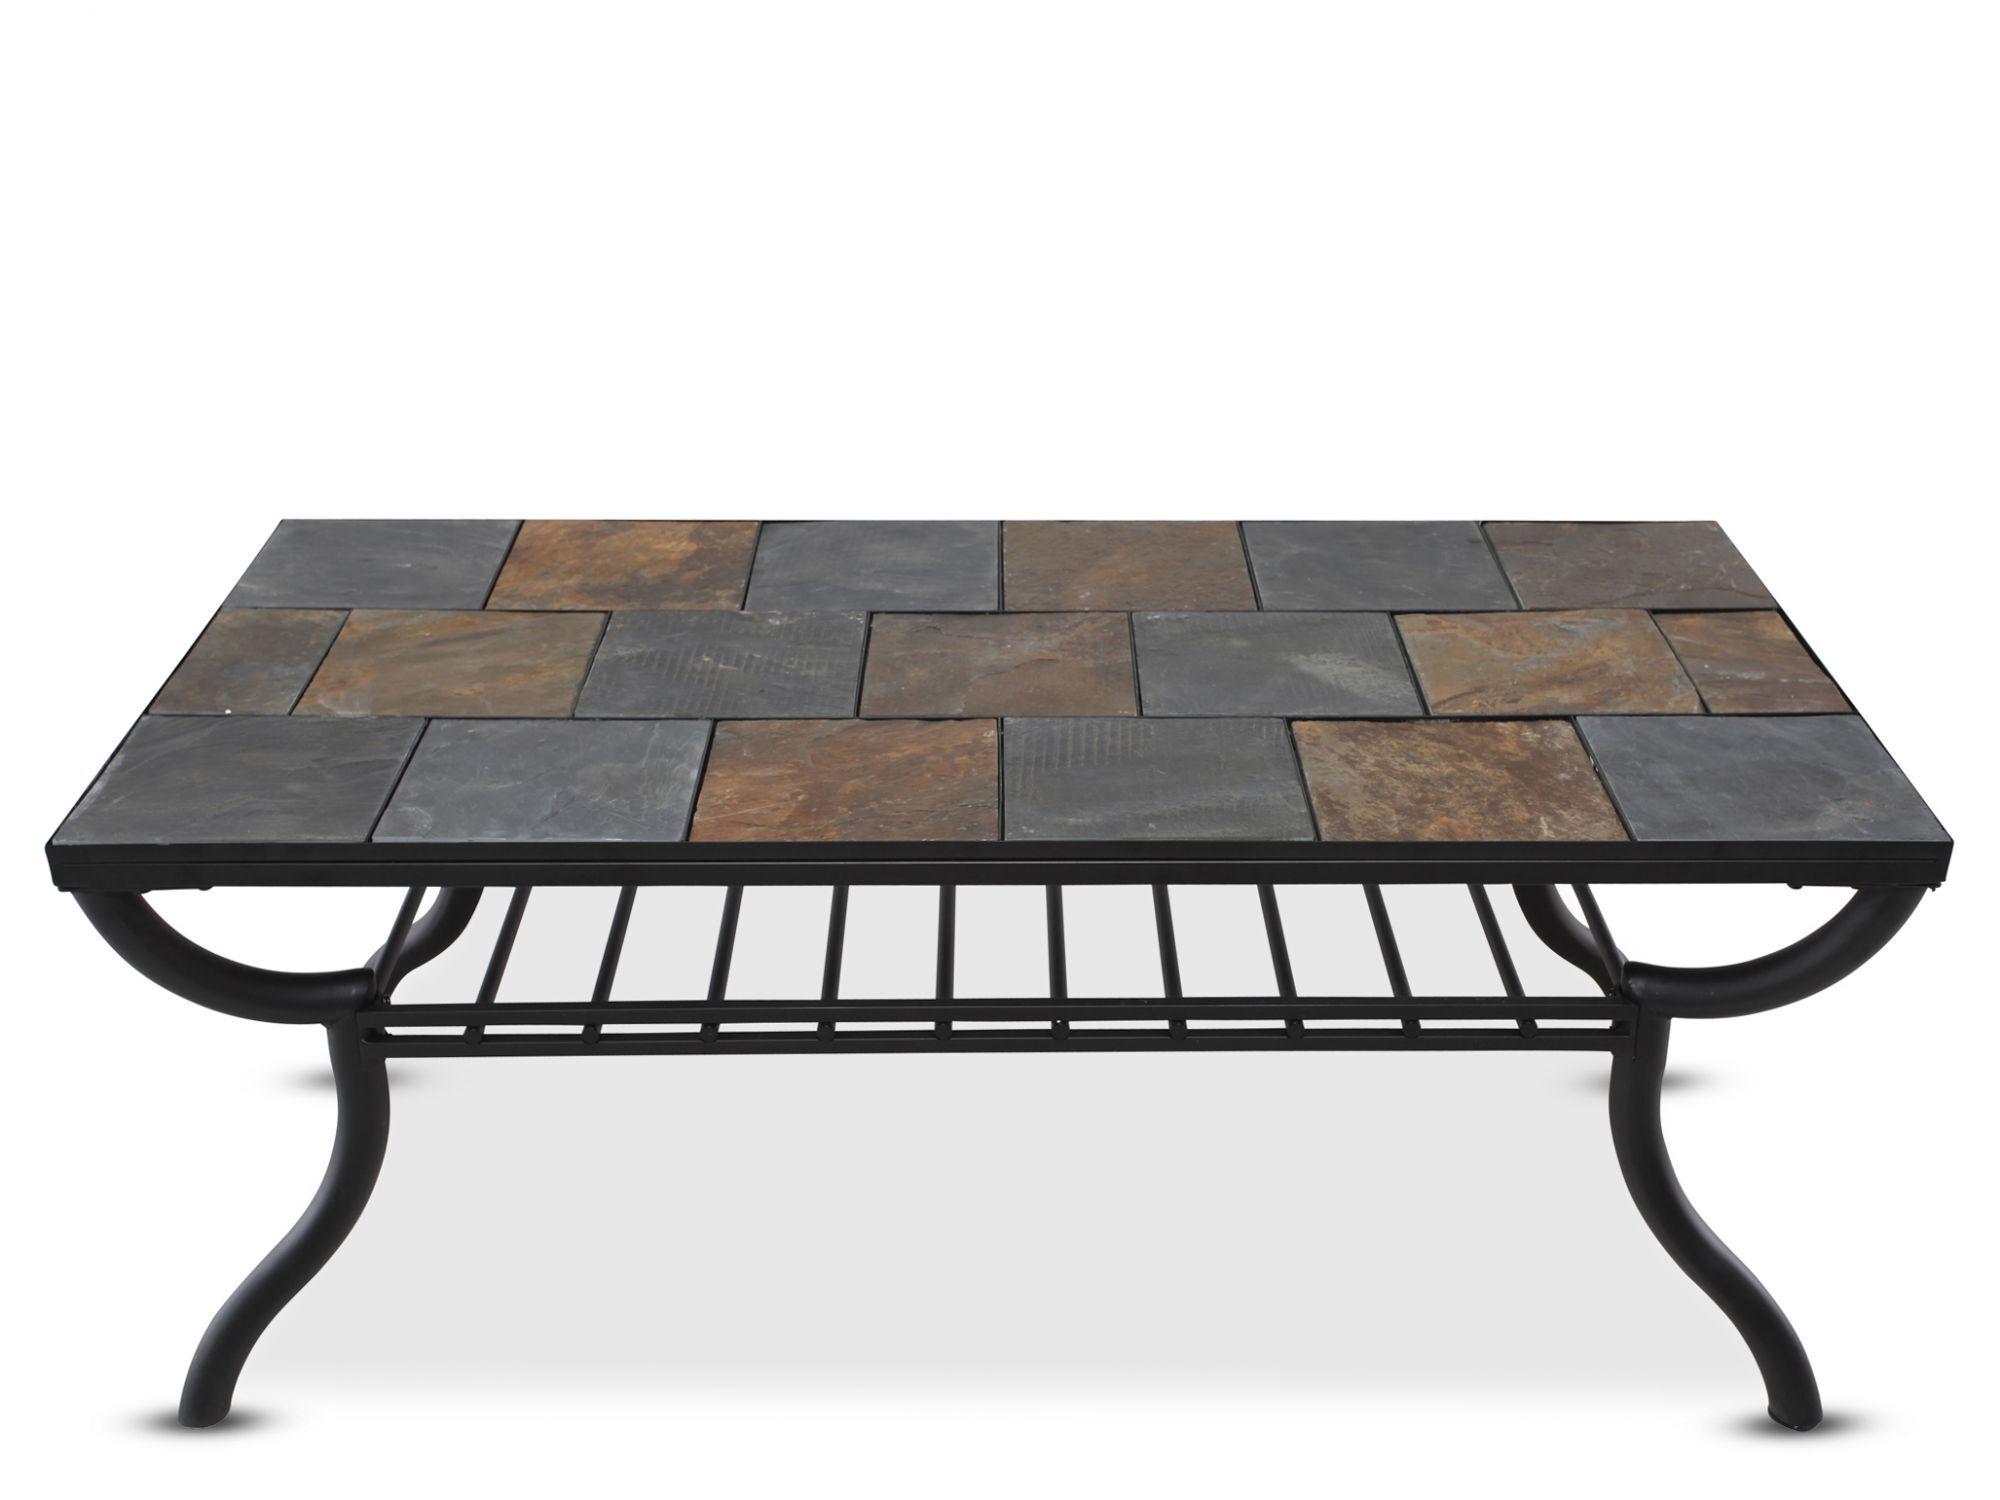 Delightful Tile Top Rectangular Cocktail Tableu0026nbsp;in Gunmetal